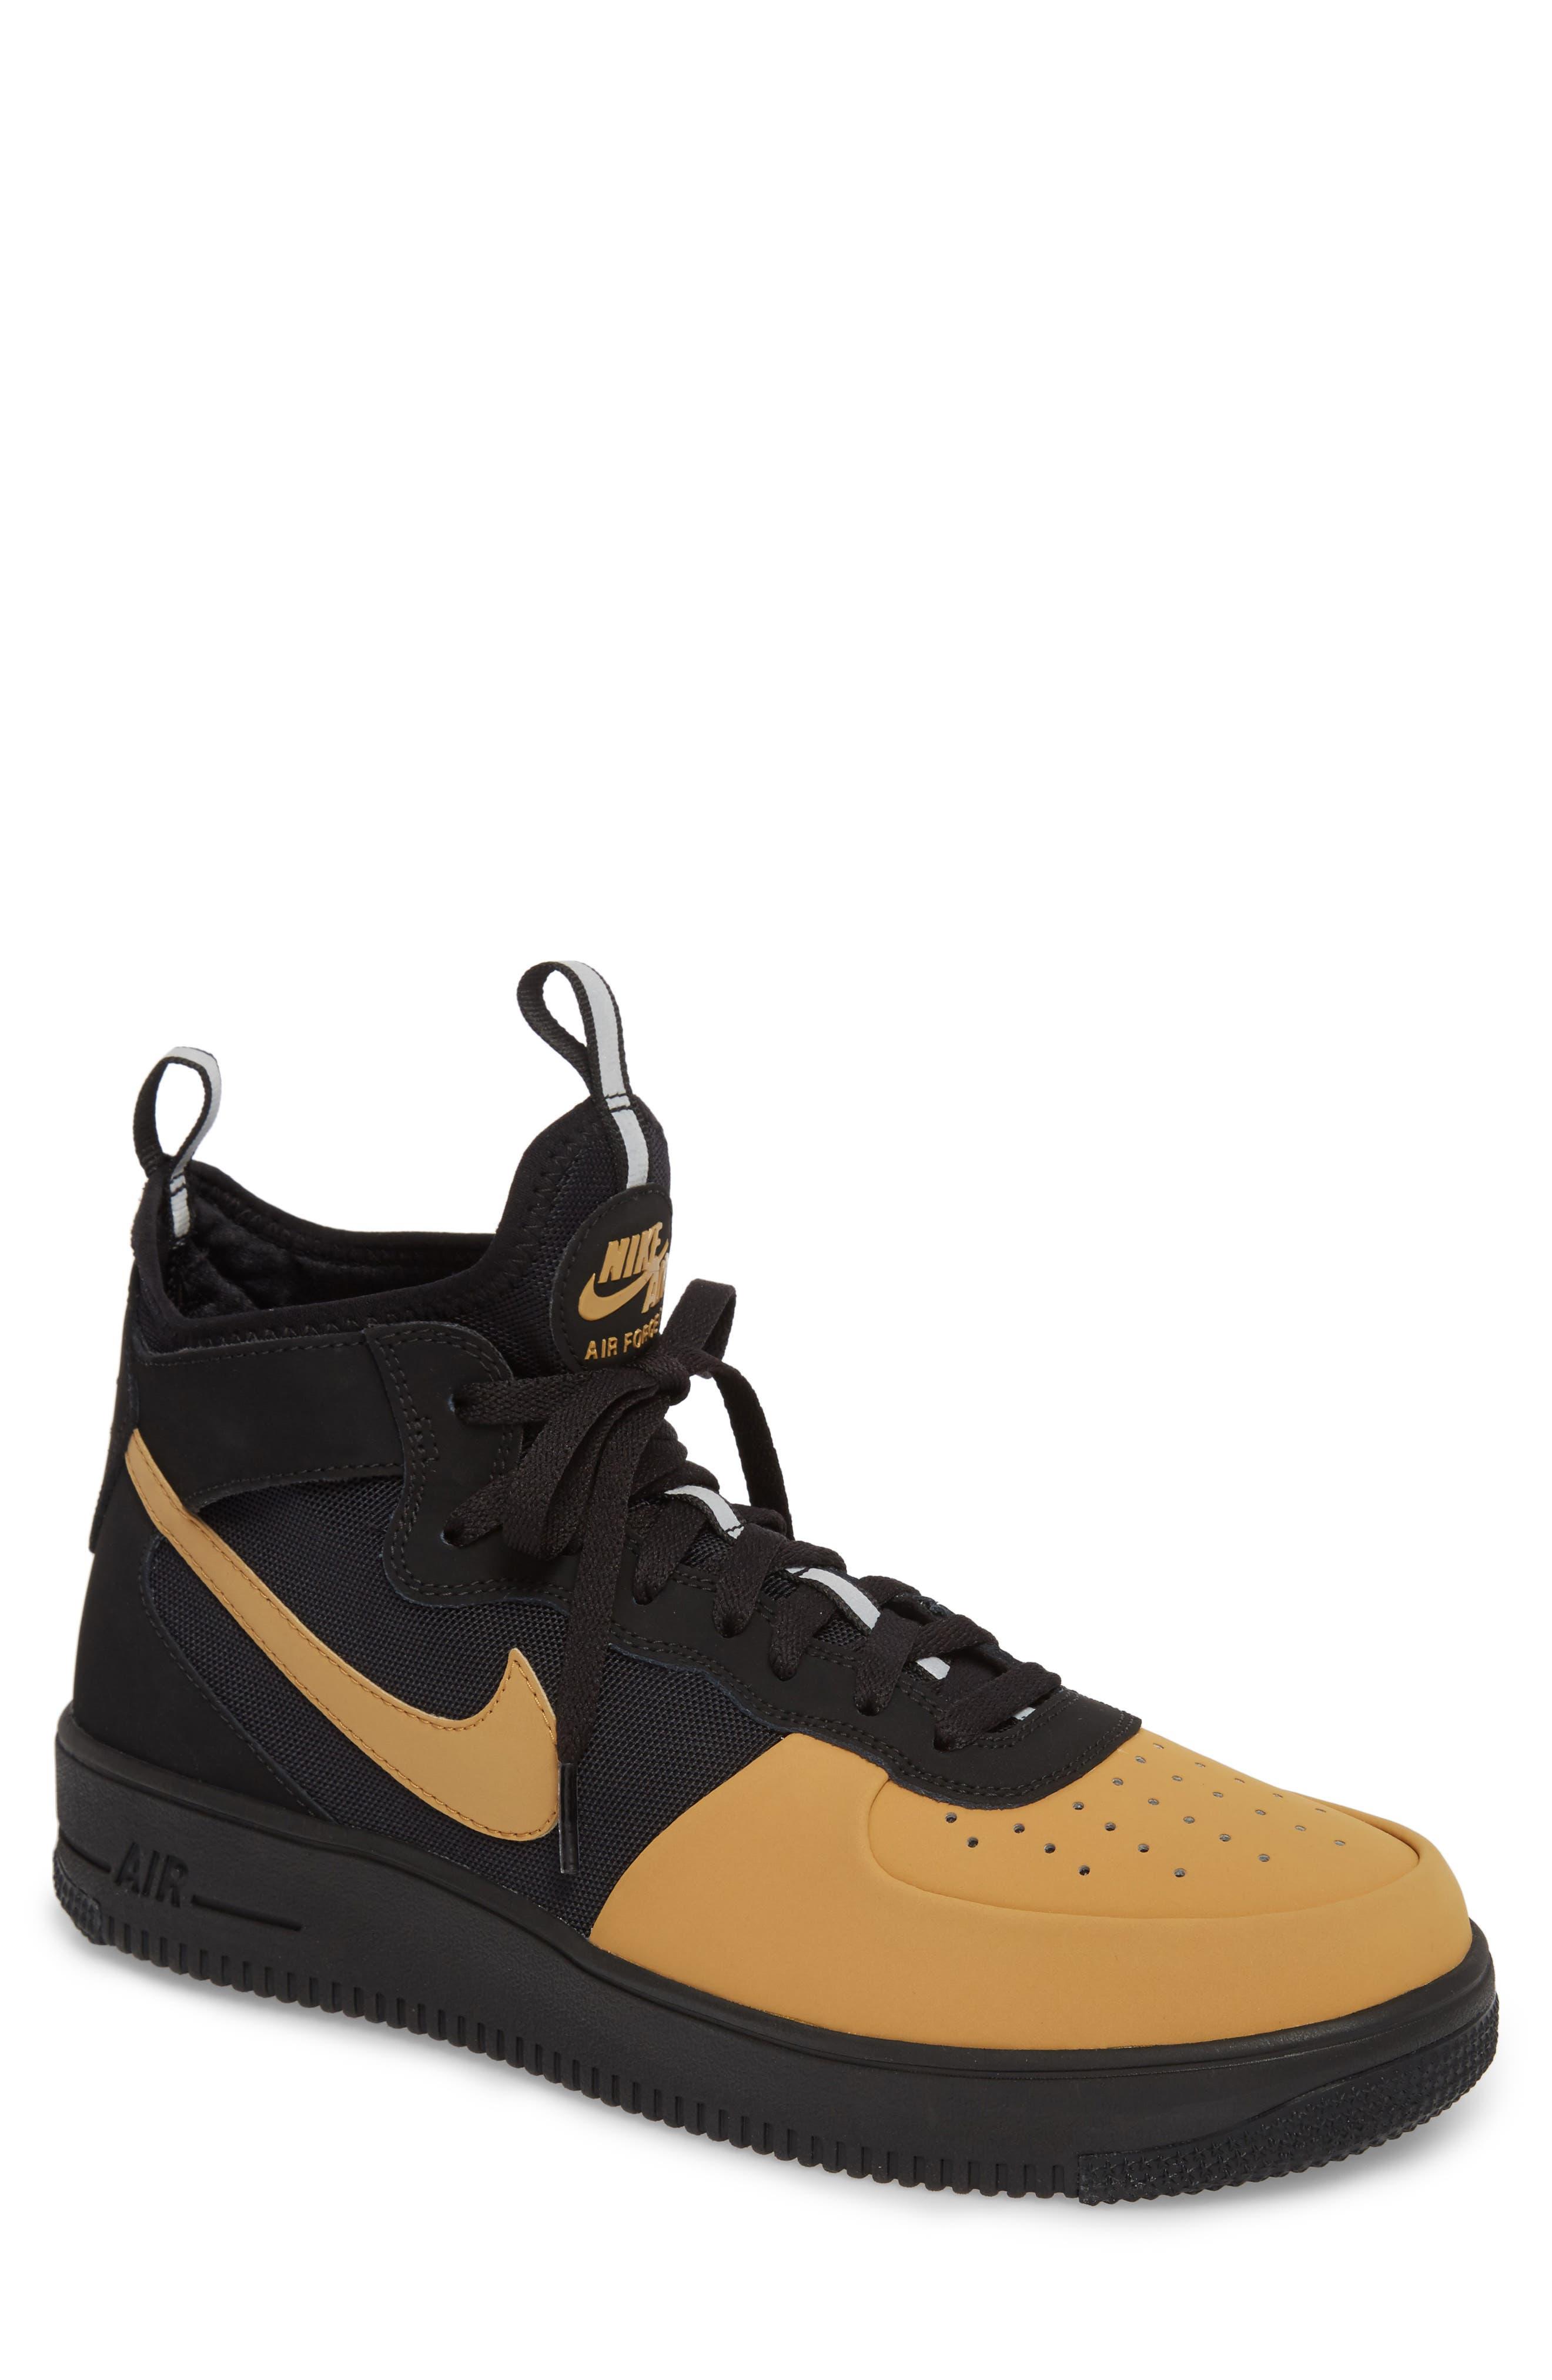 Air Force 1 Ultraforce Mid Tech Sneaker,                             Main thumbnail 1, color,                             002